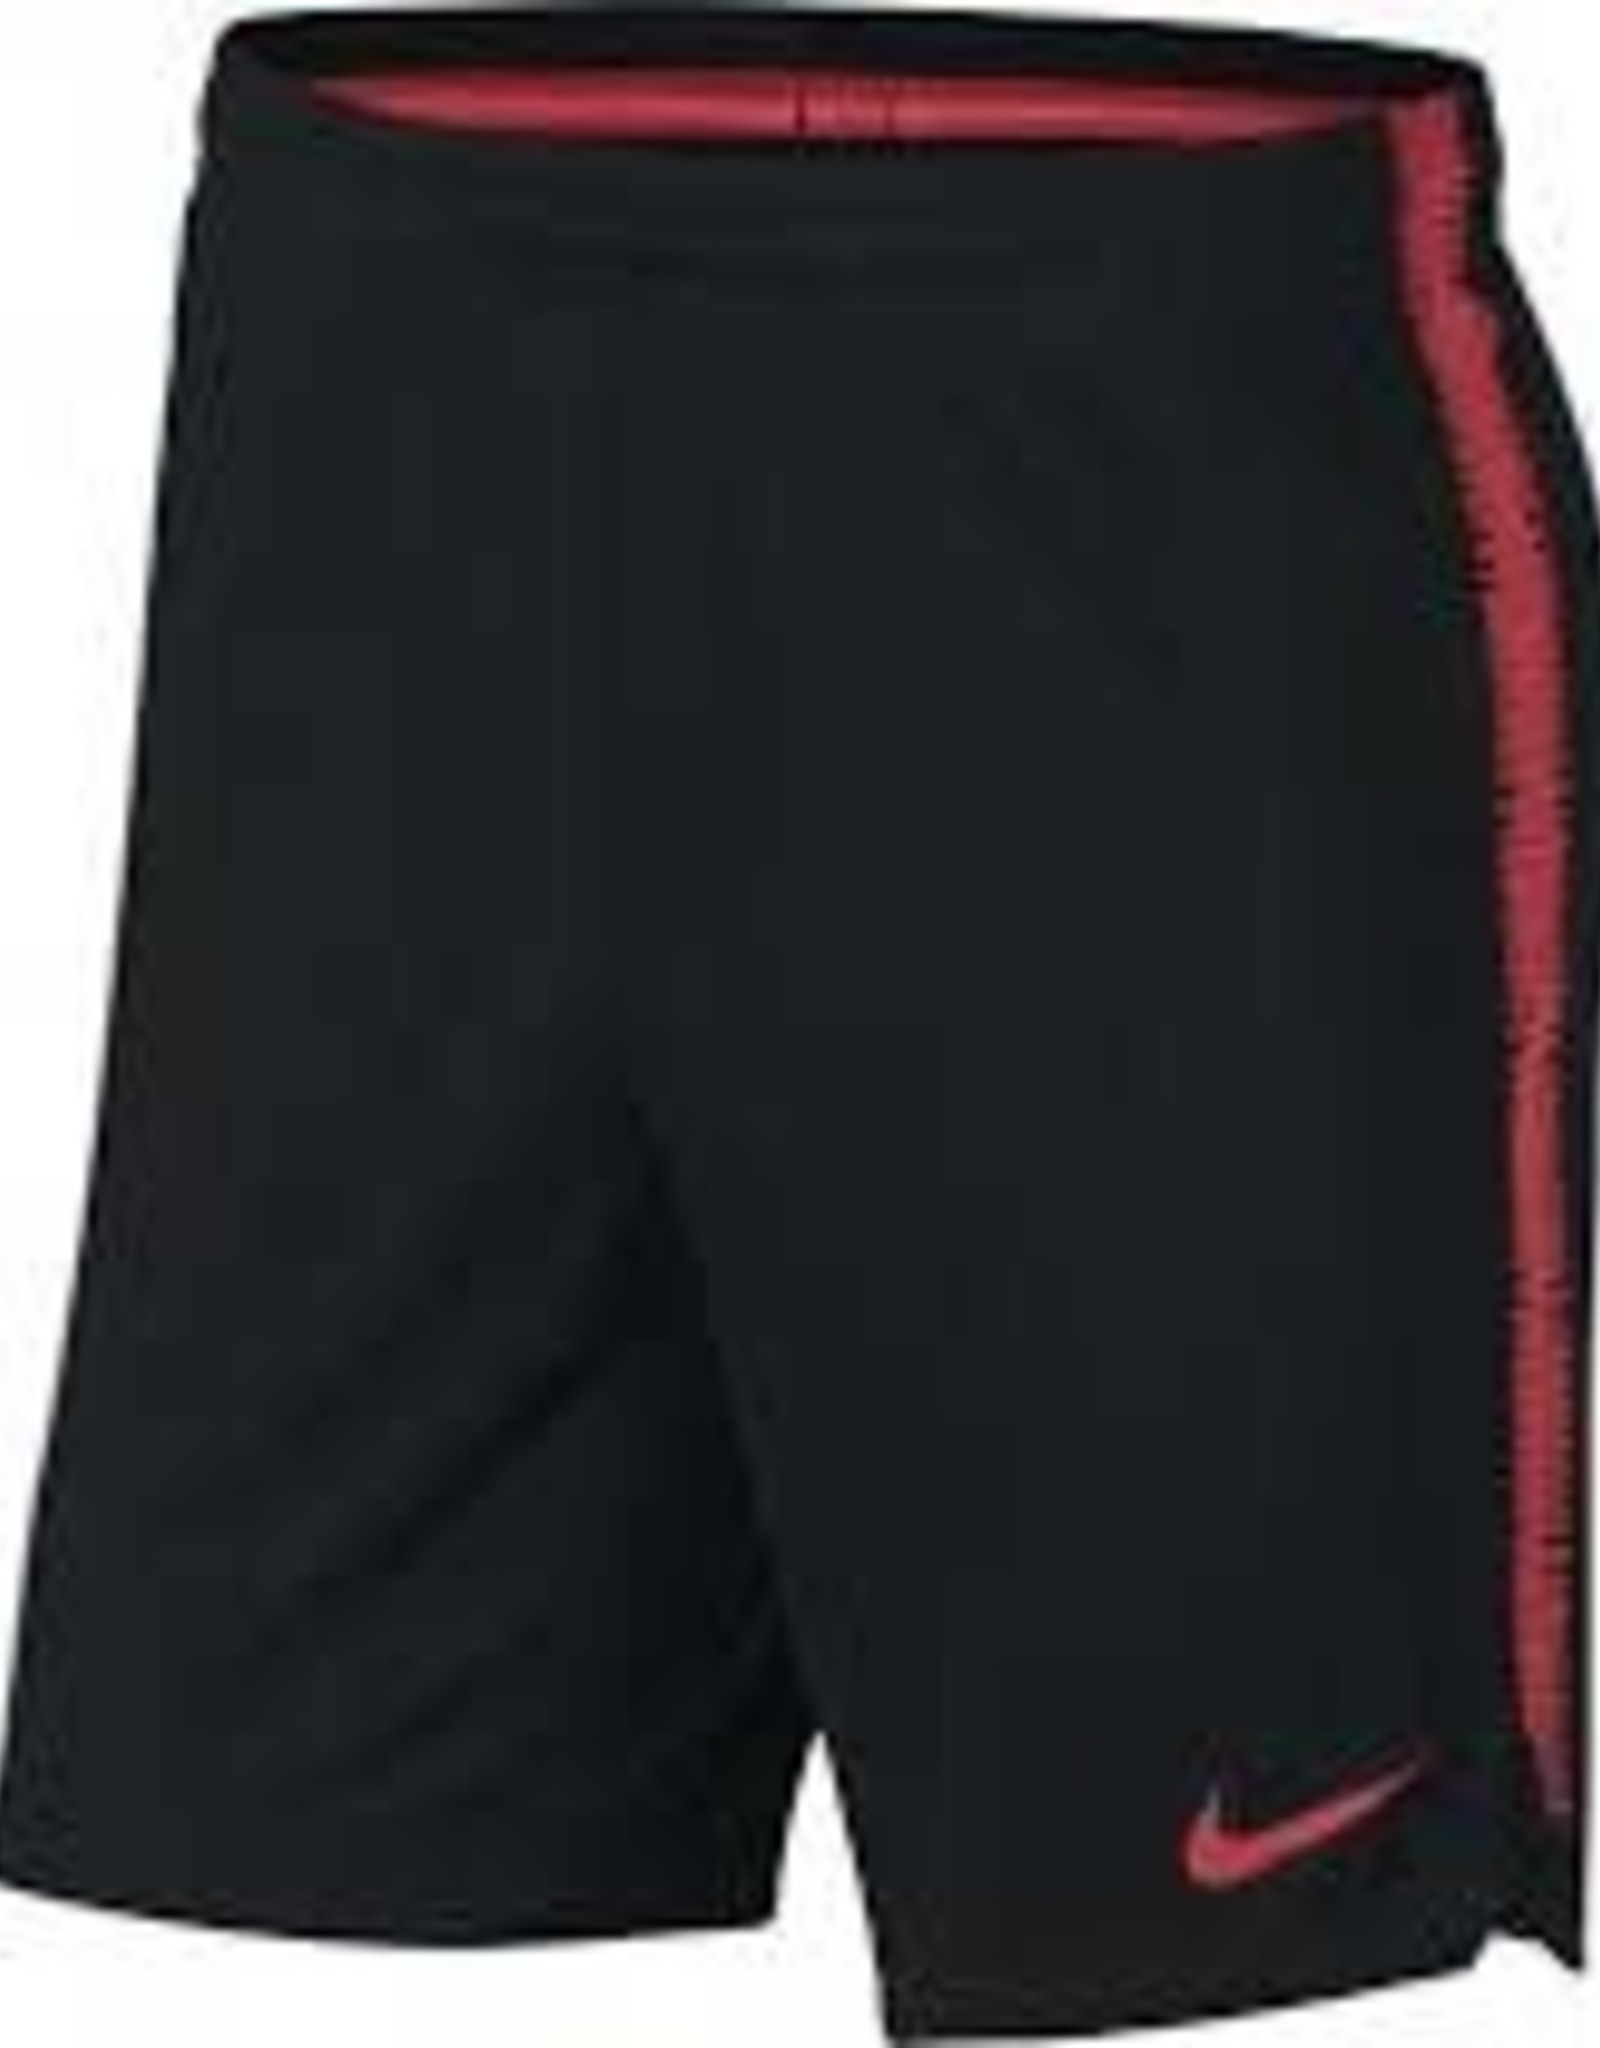 Nike short XL